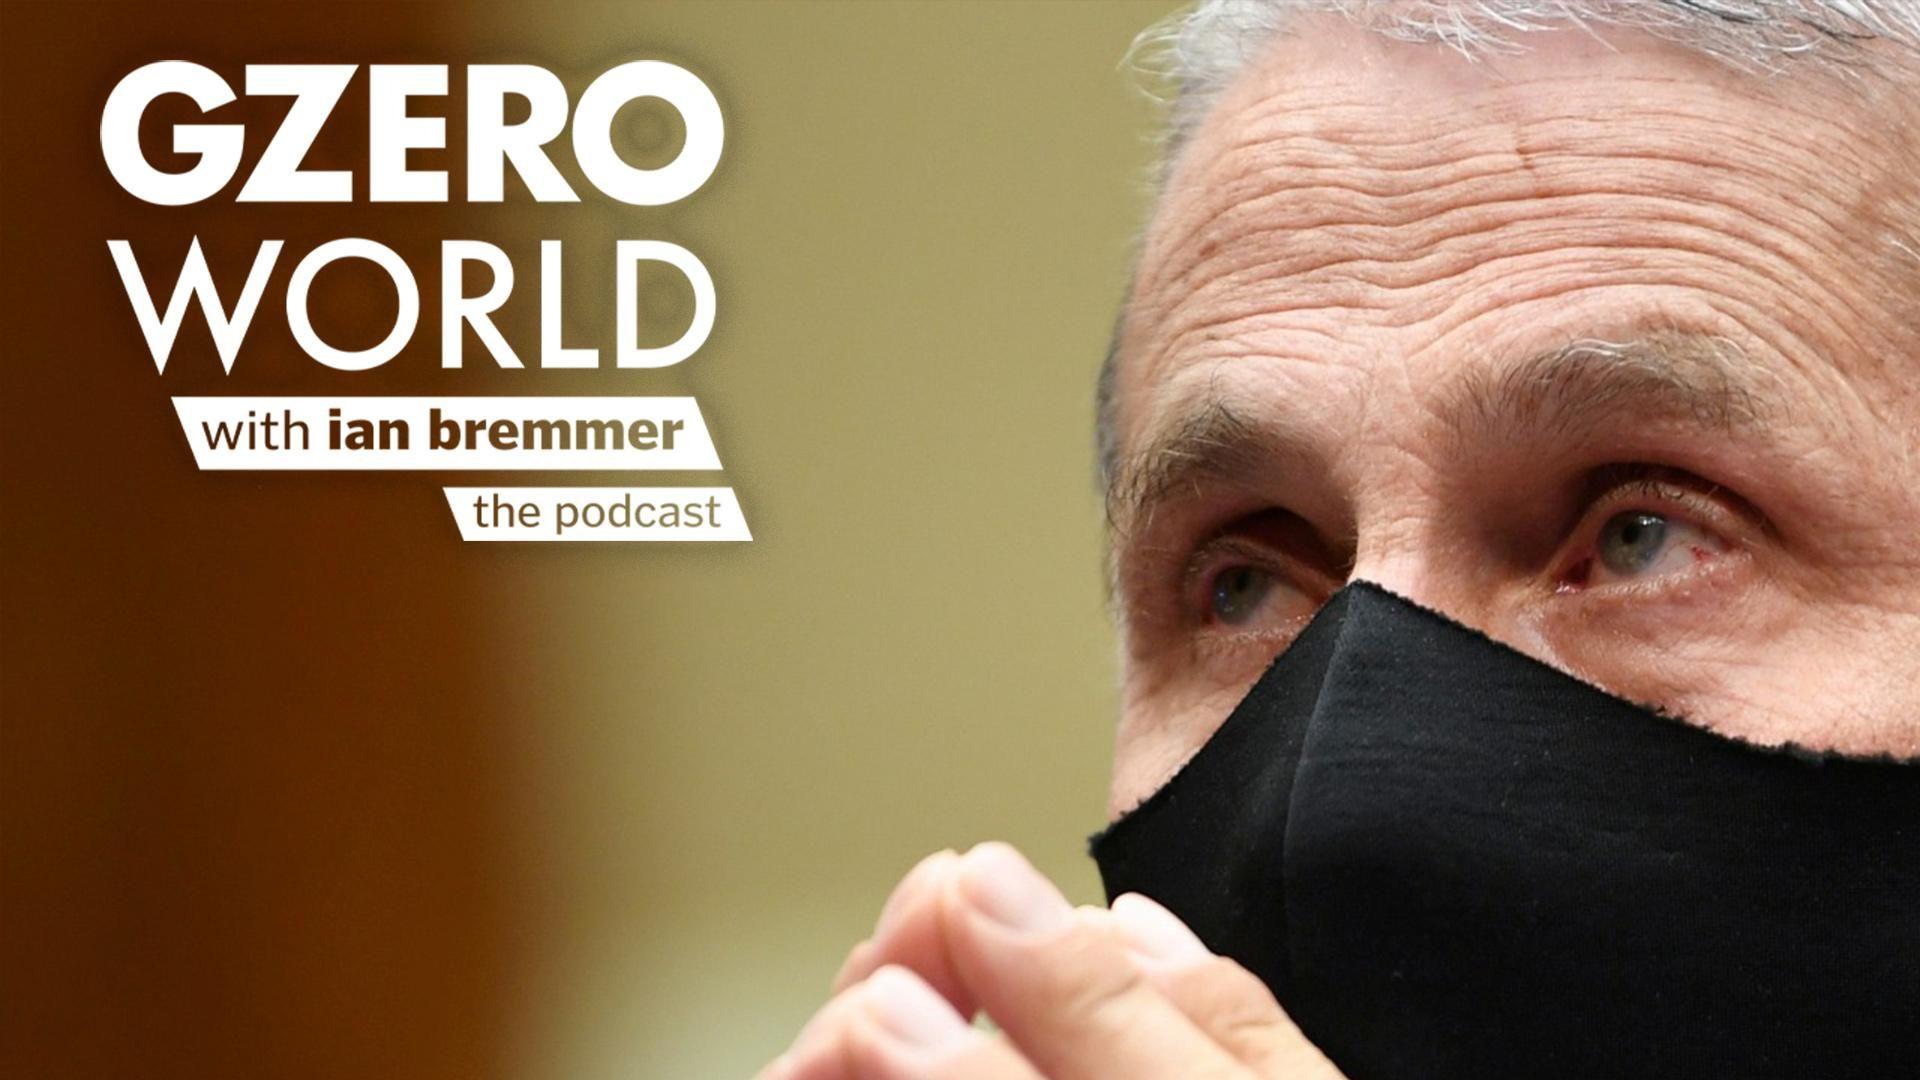 Podcast: Dr. Fauci's Pandemic Prognosis